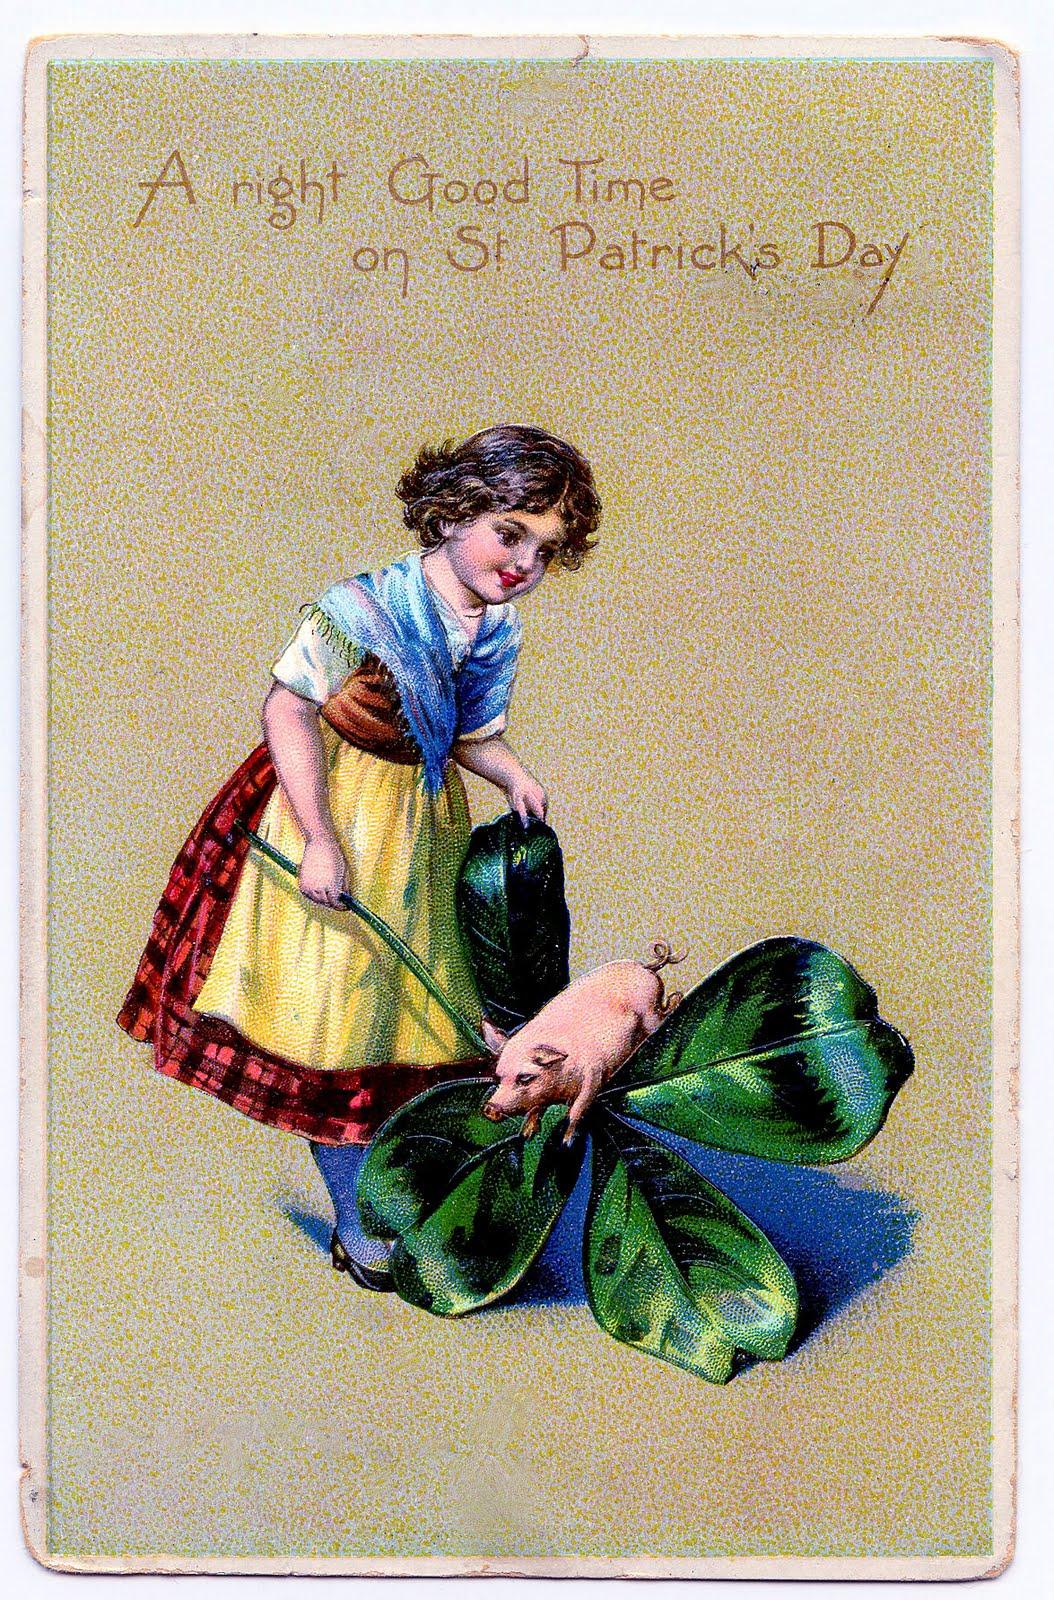 Free Vintage Clip Art St Patricks Day Card The